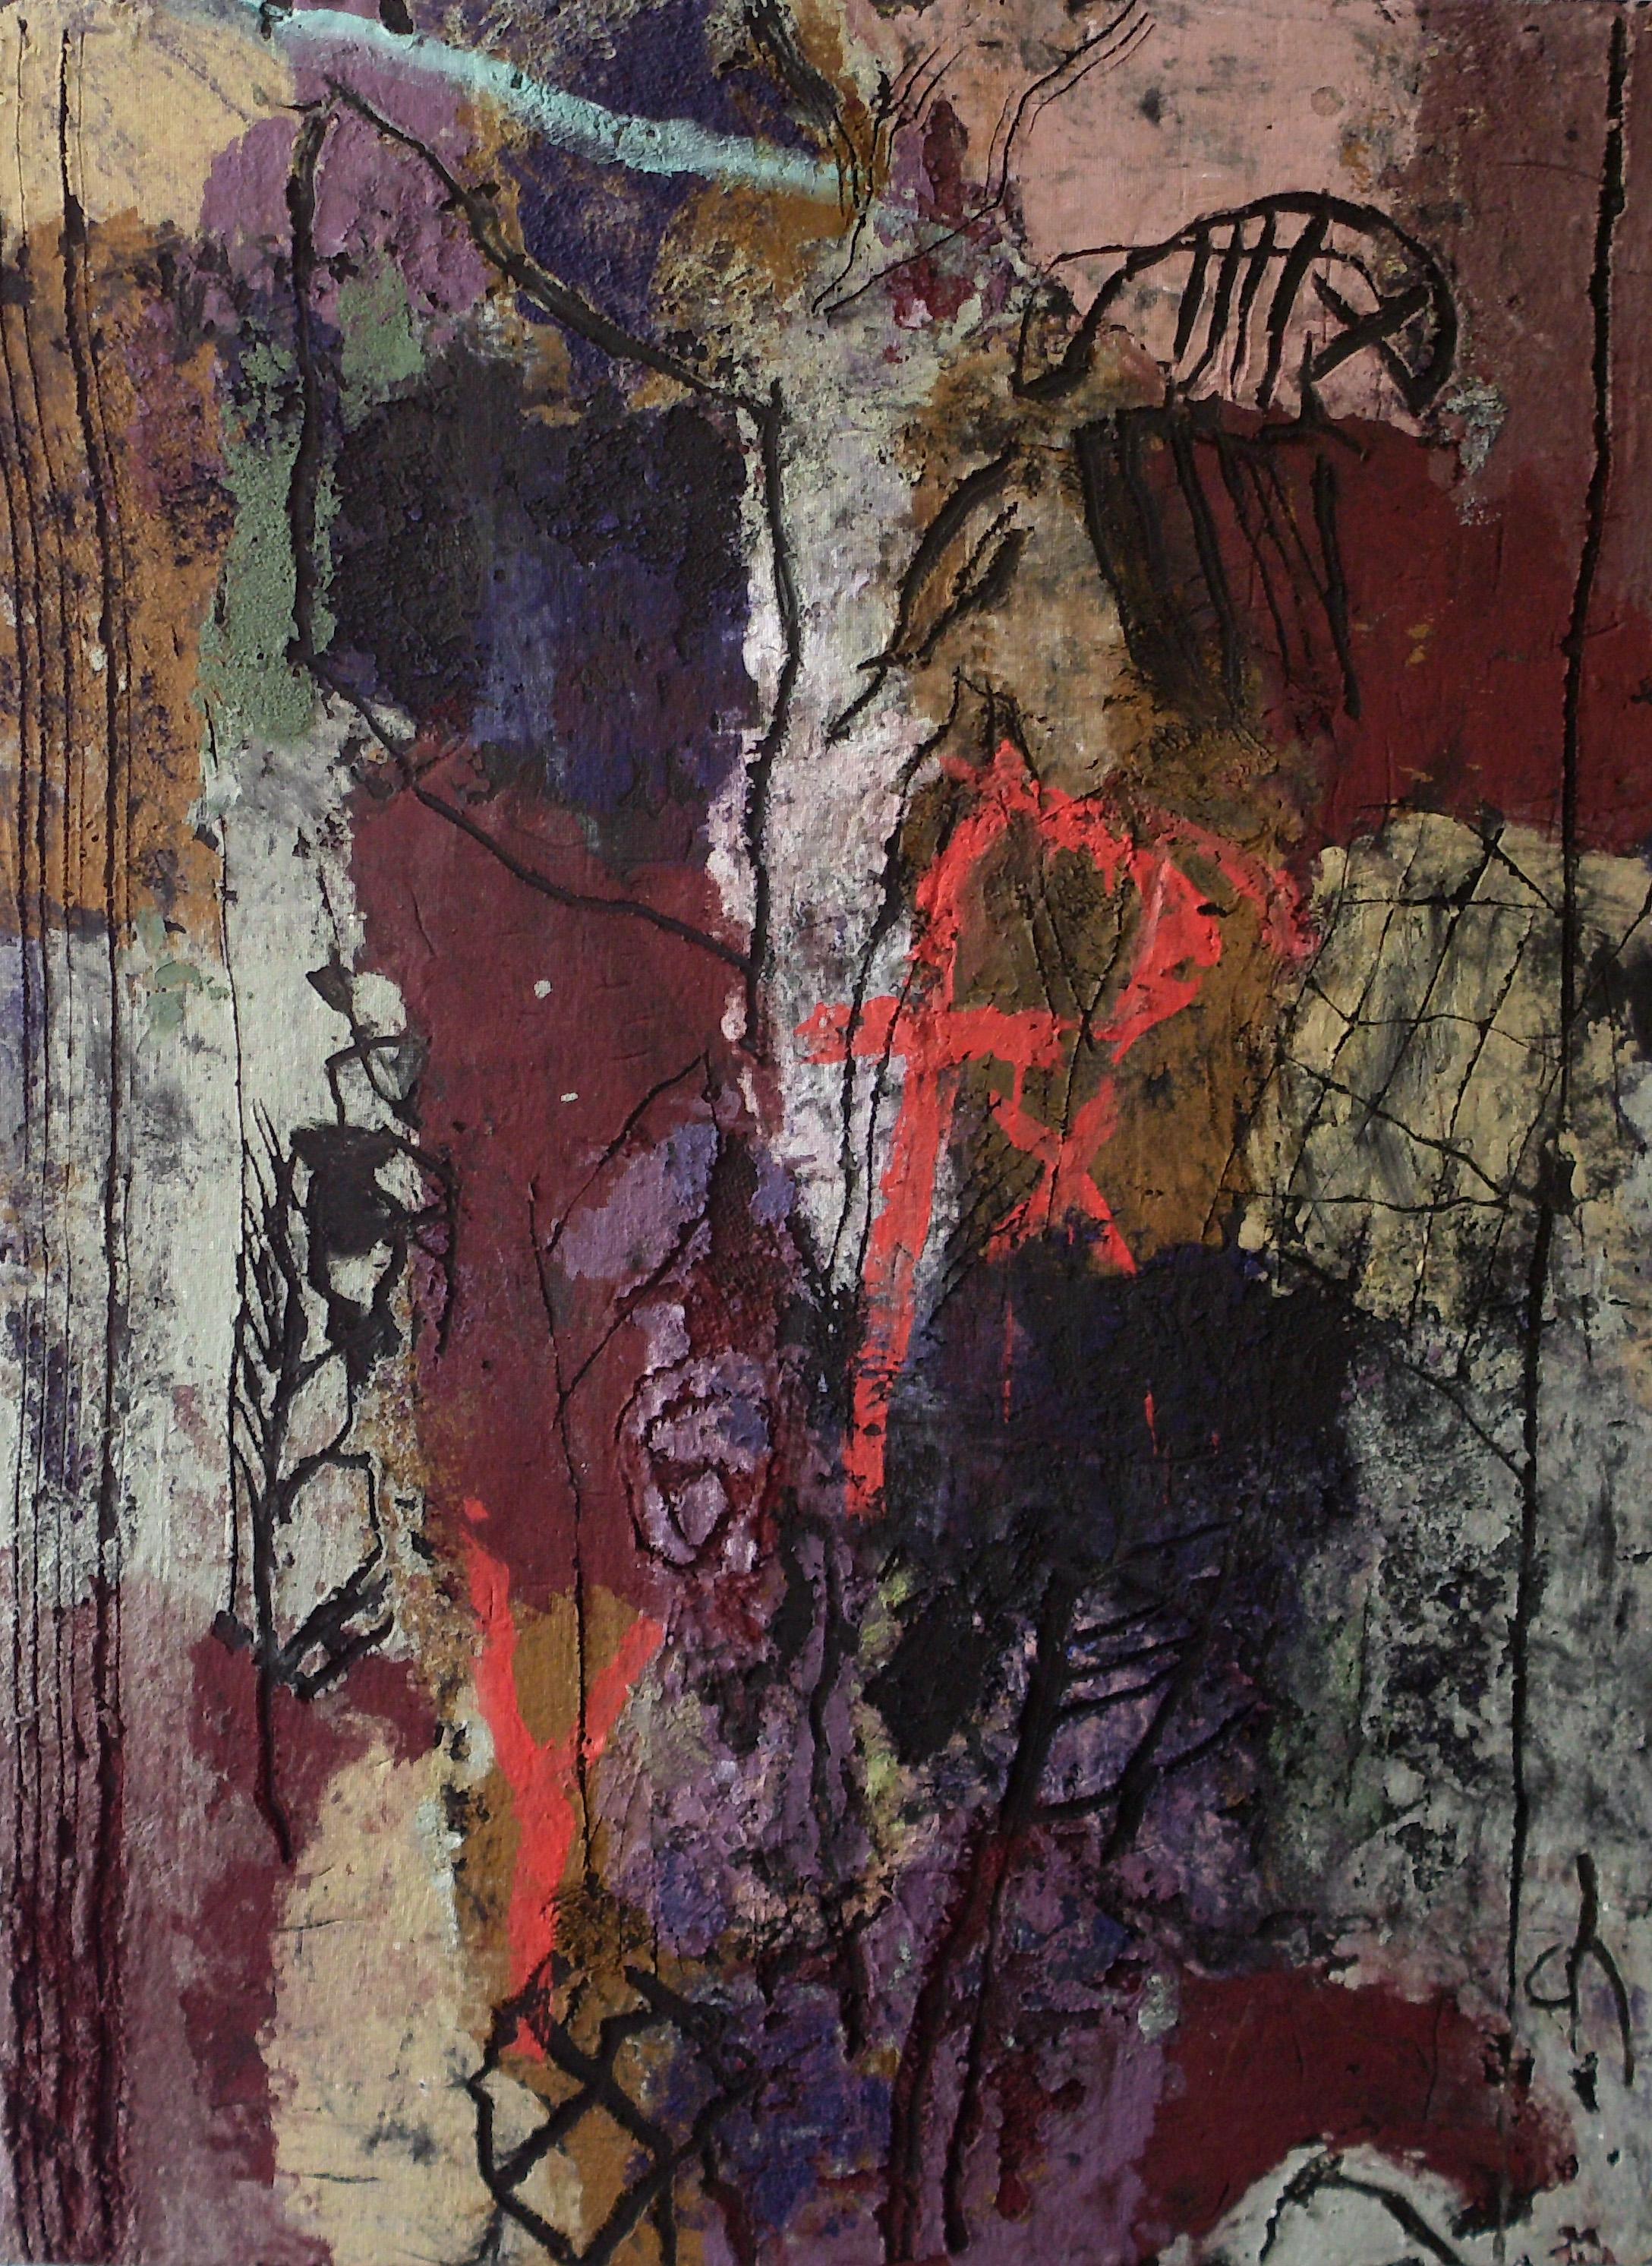 08-christian_hasse-komposition_py-2010-acryl_auf_hartfaser-122x91